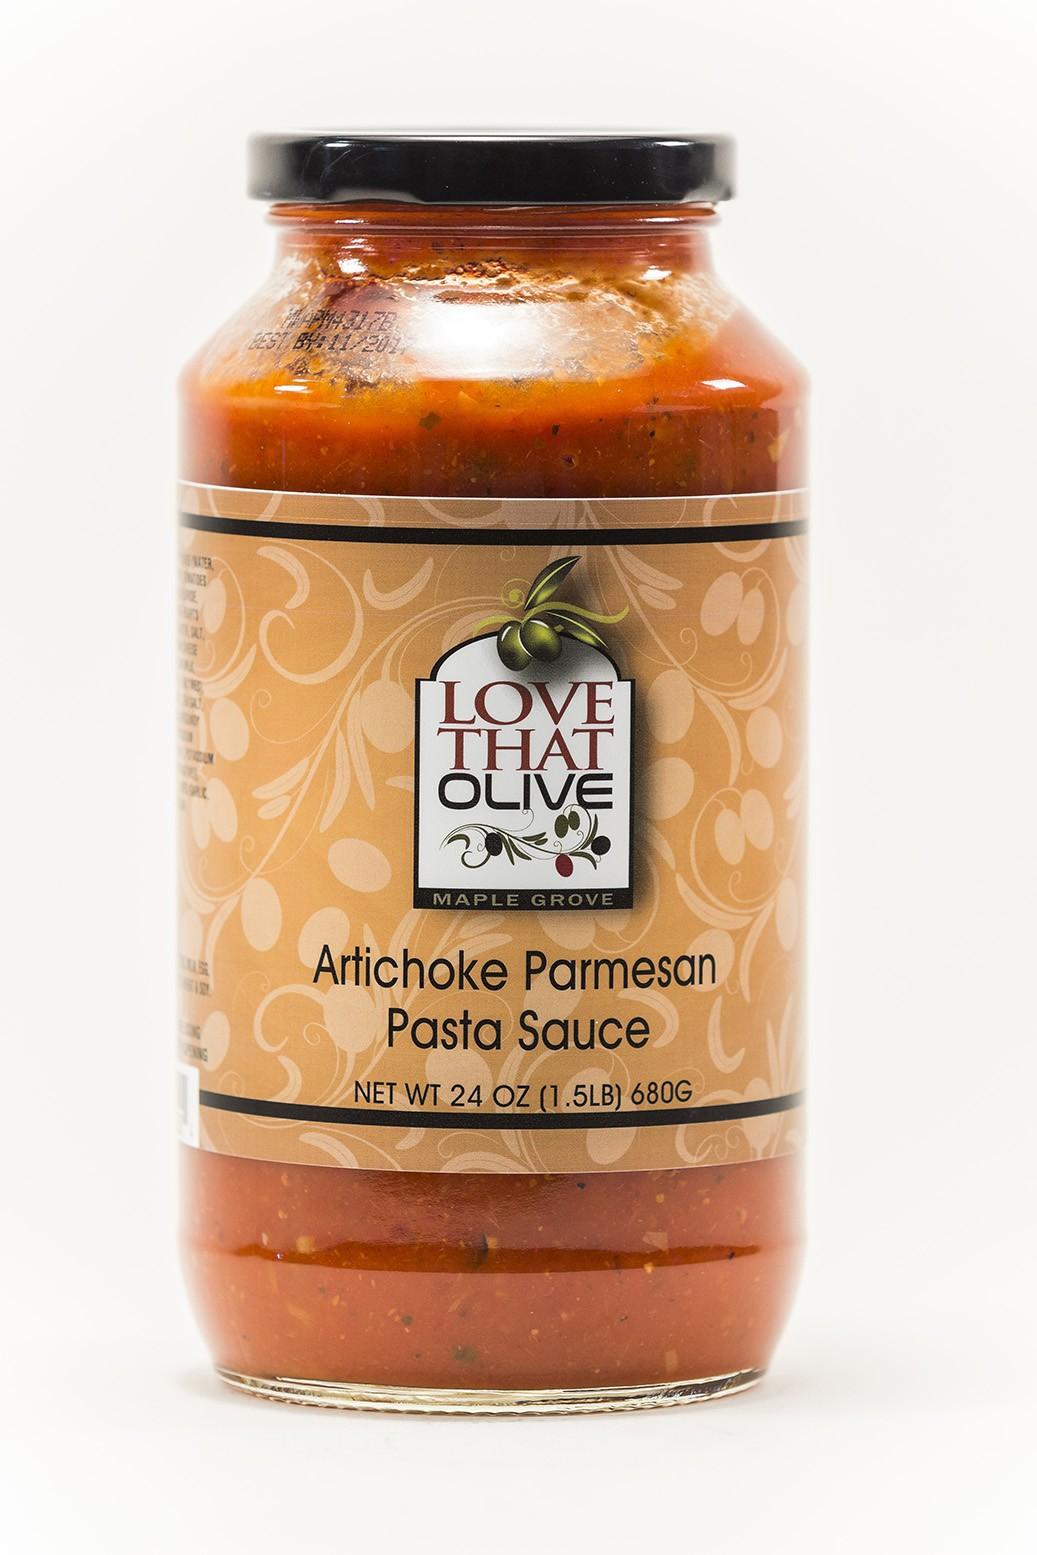 Artichoke Parmesan Pasta Sauce